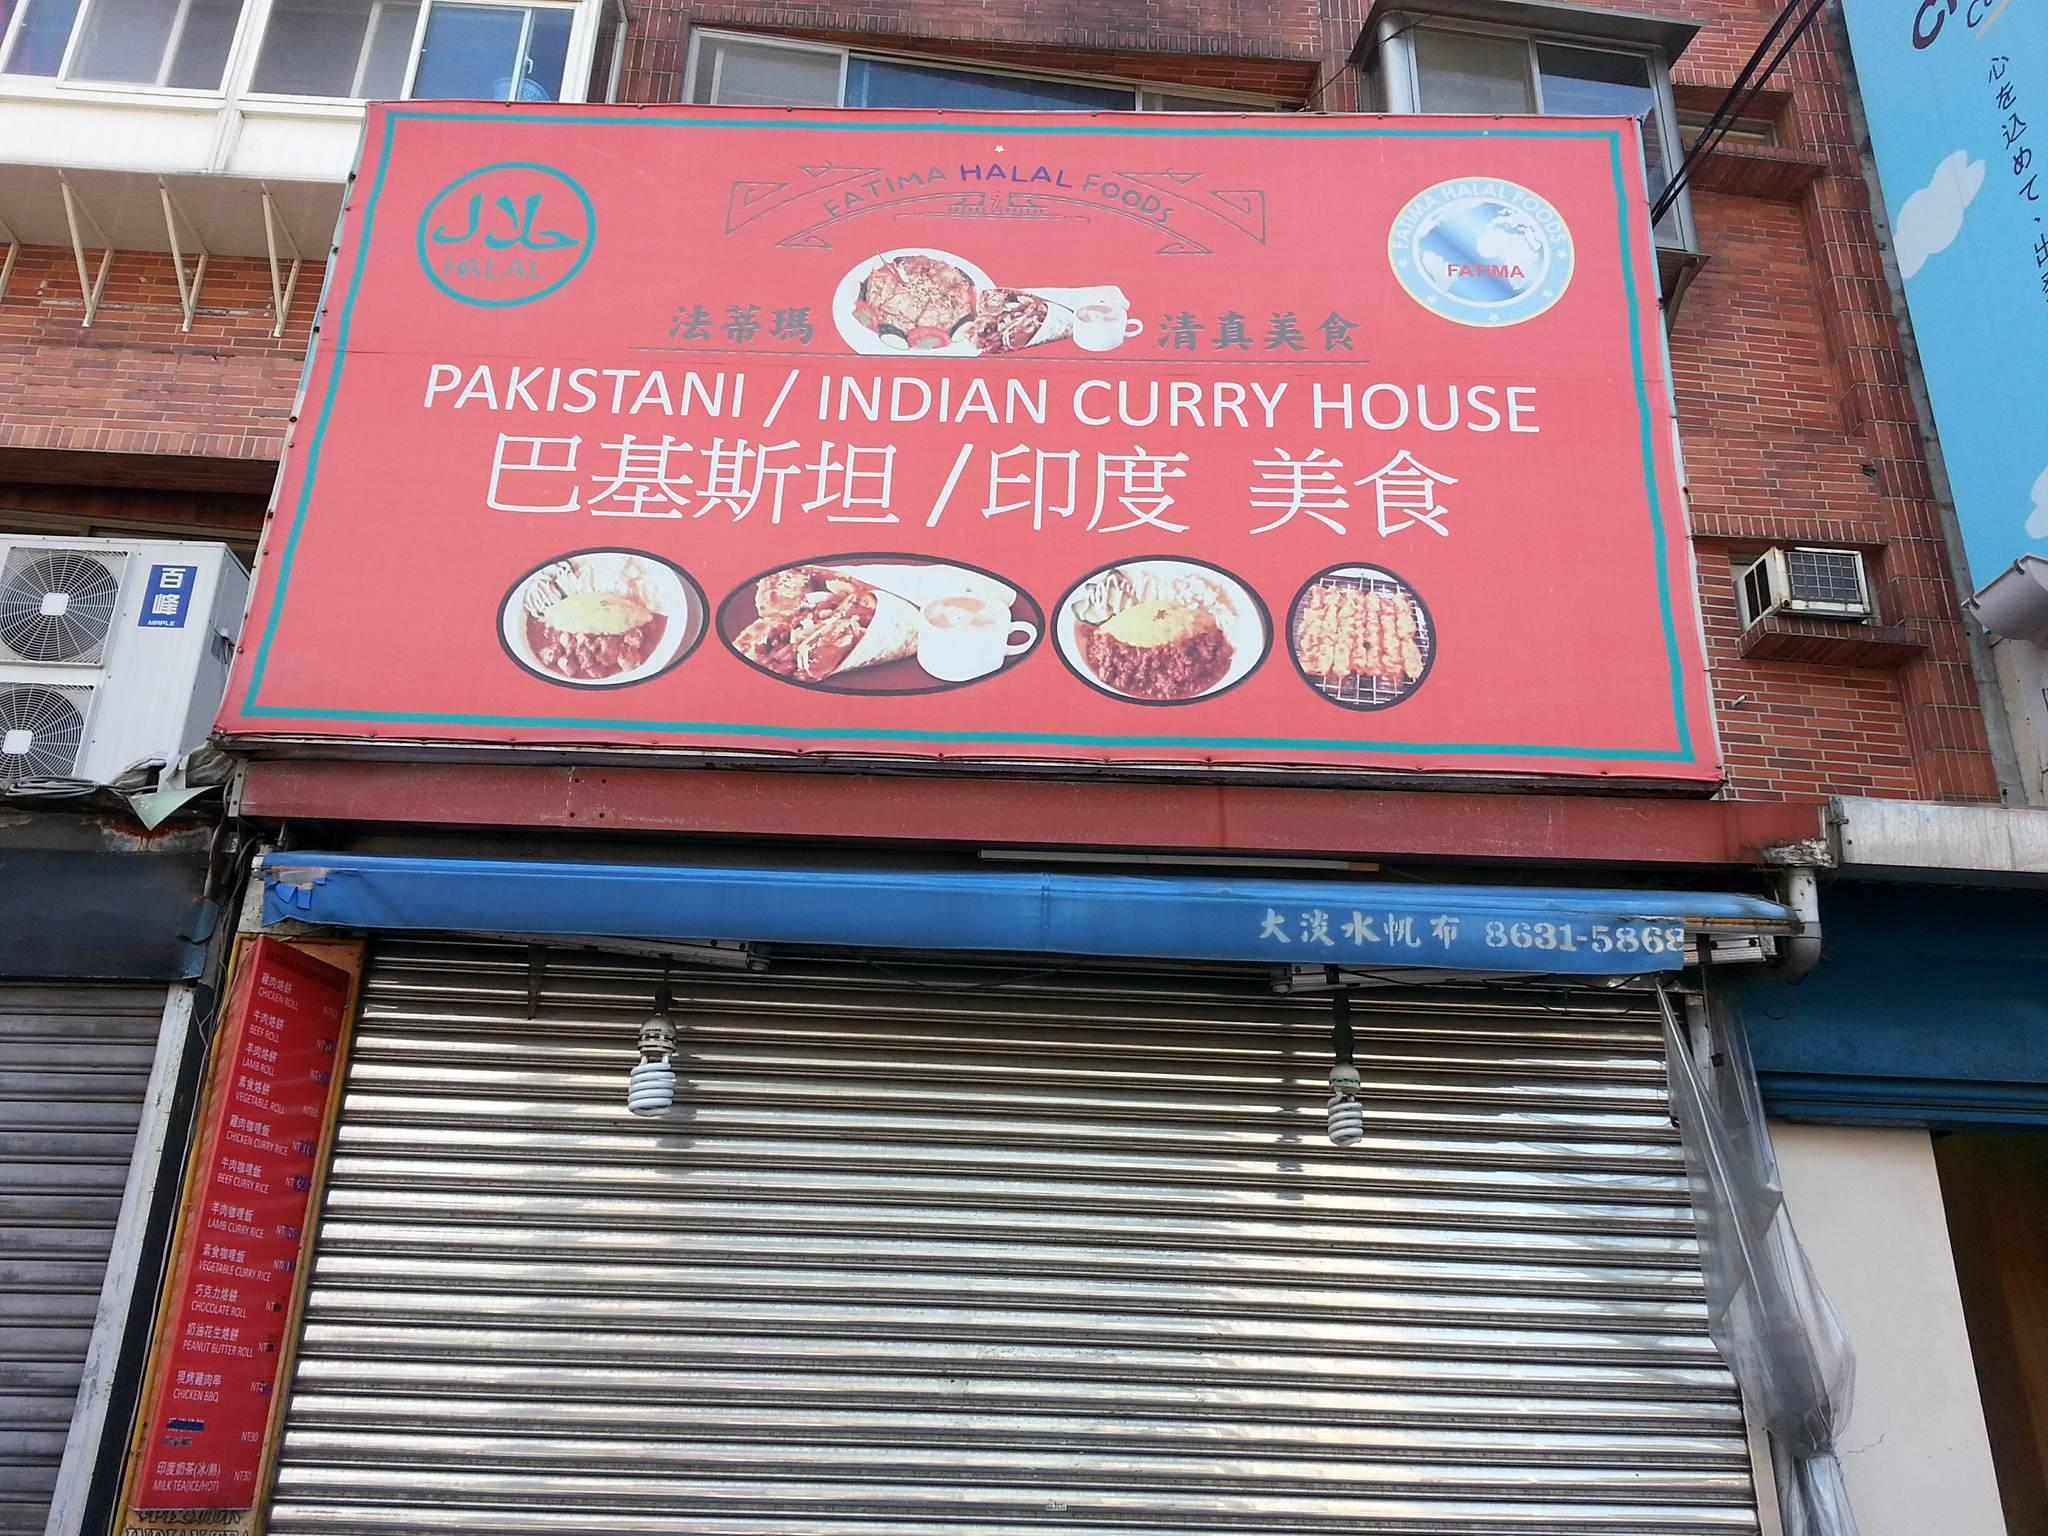 Fatima Halal Foods